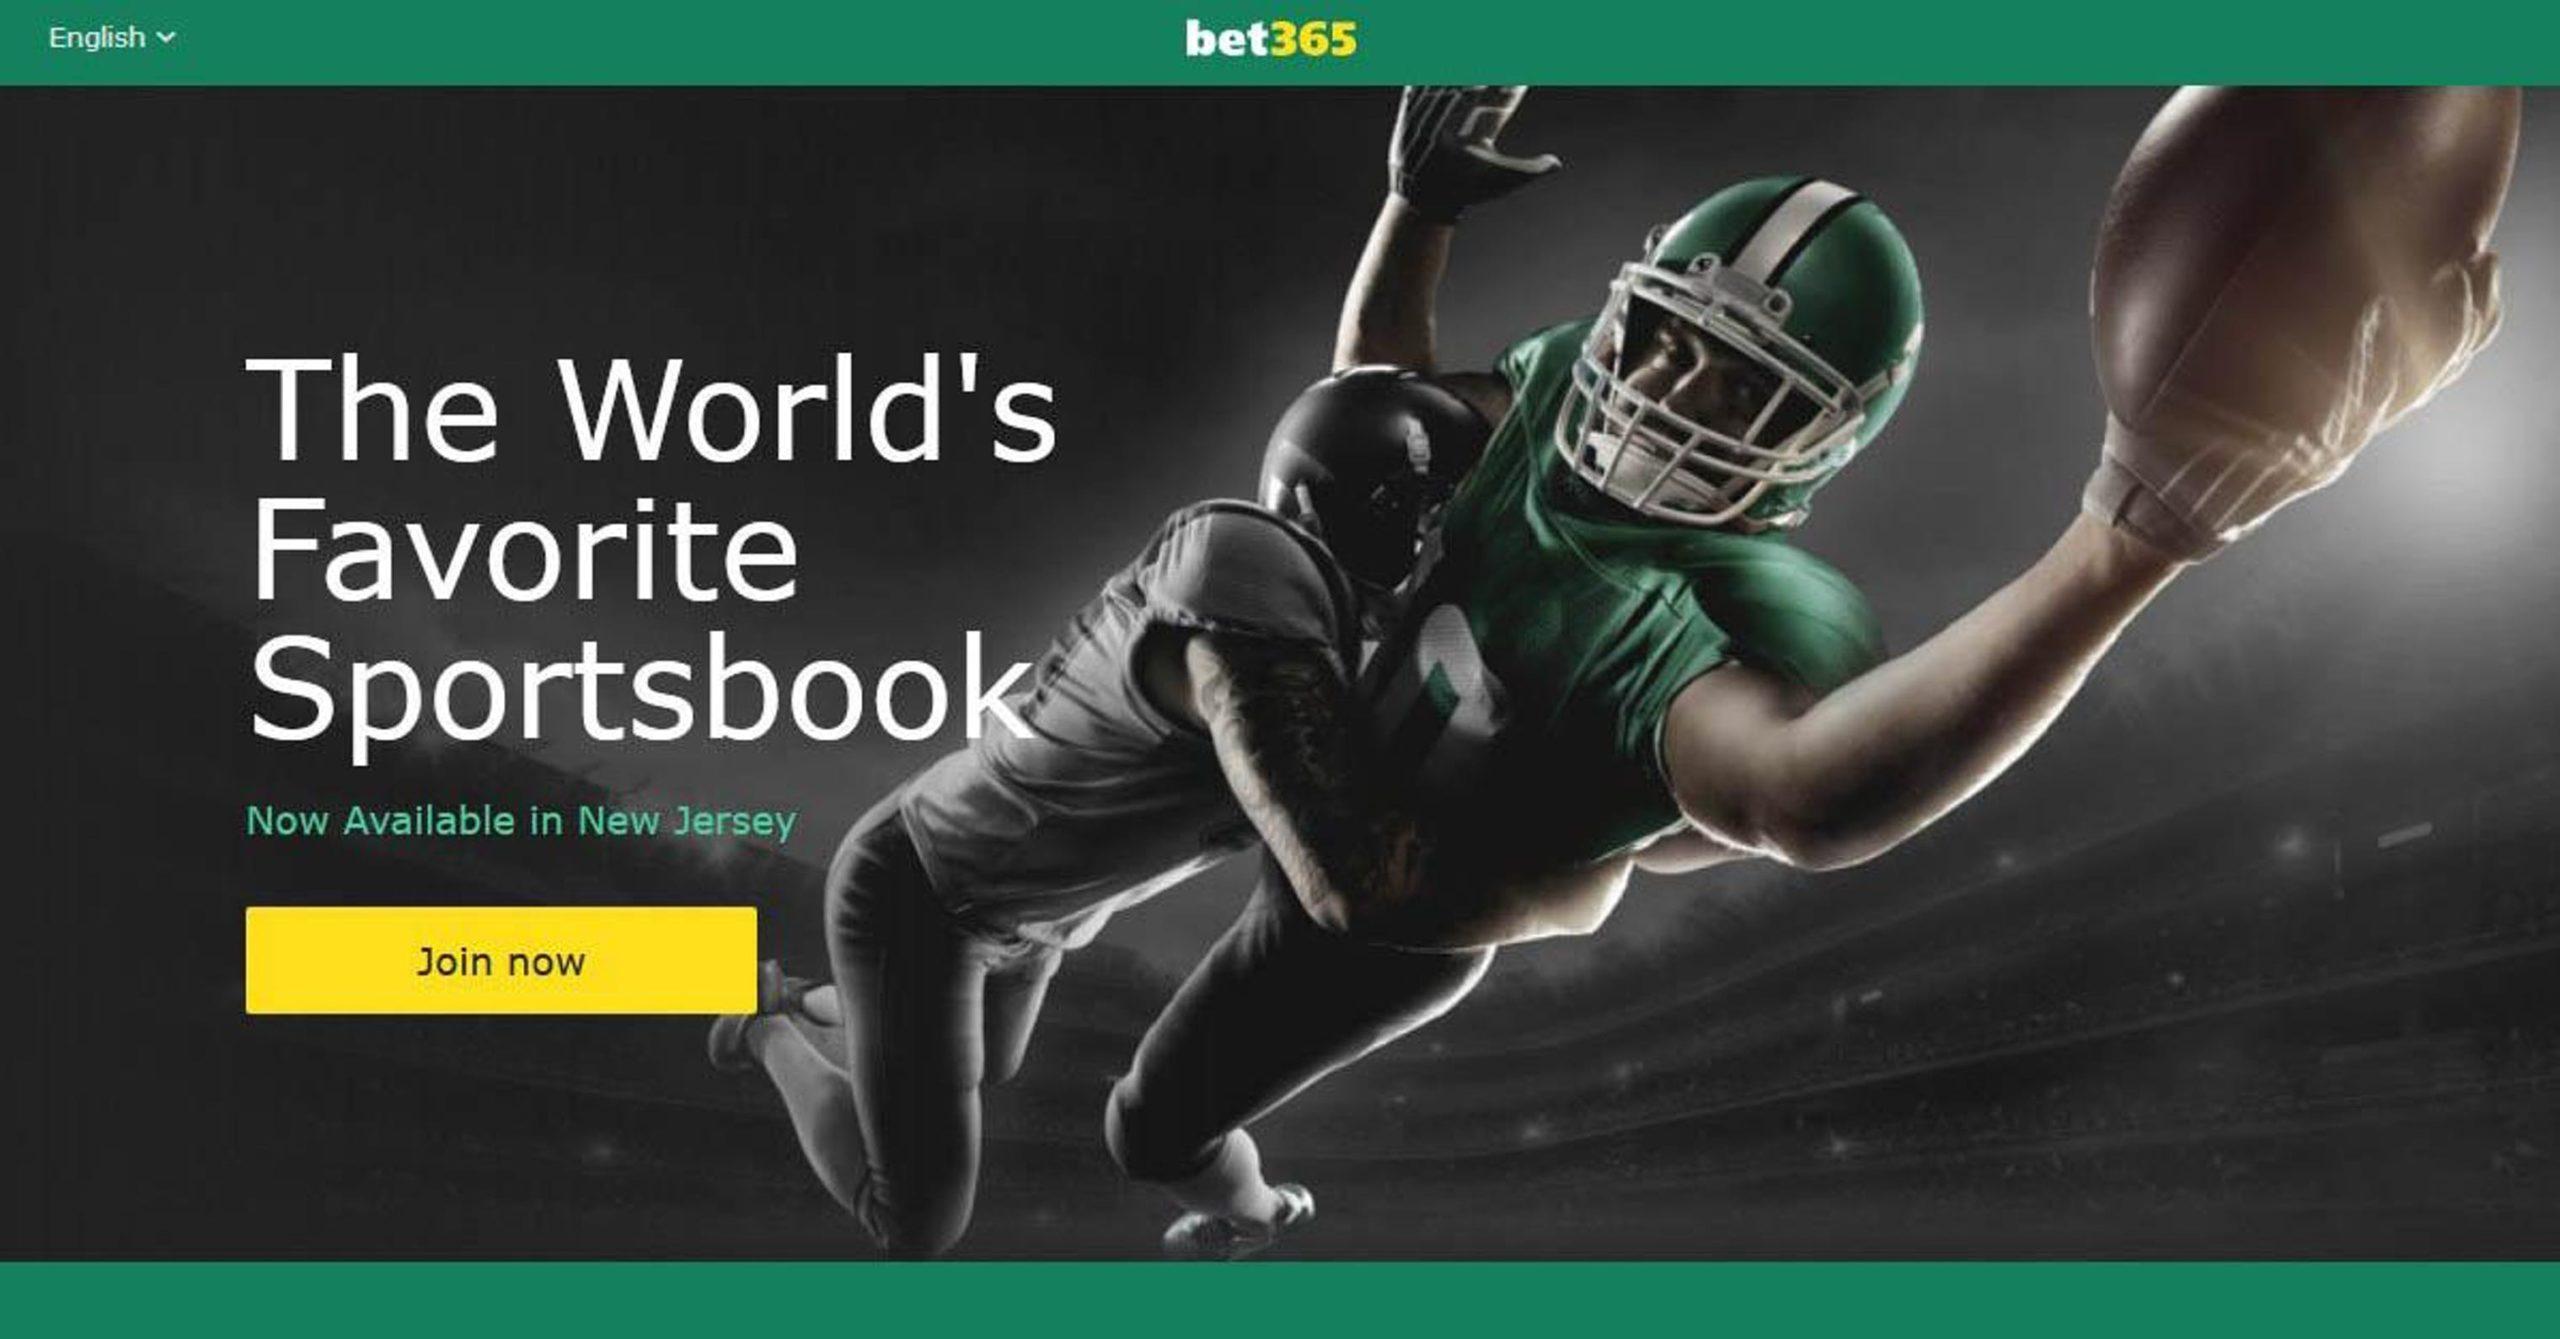 bet365 nj sportsbook